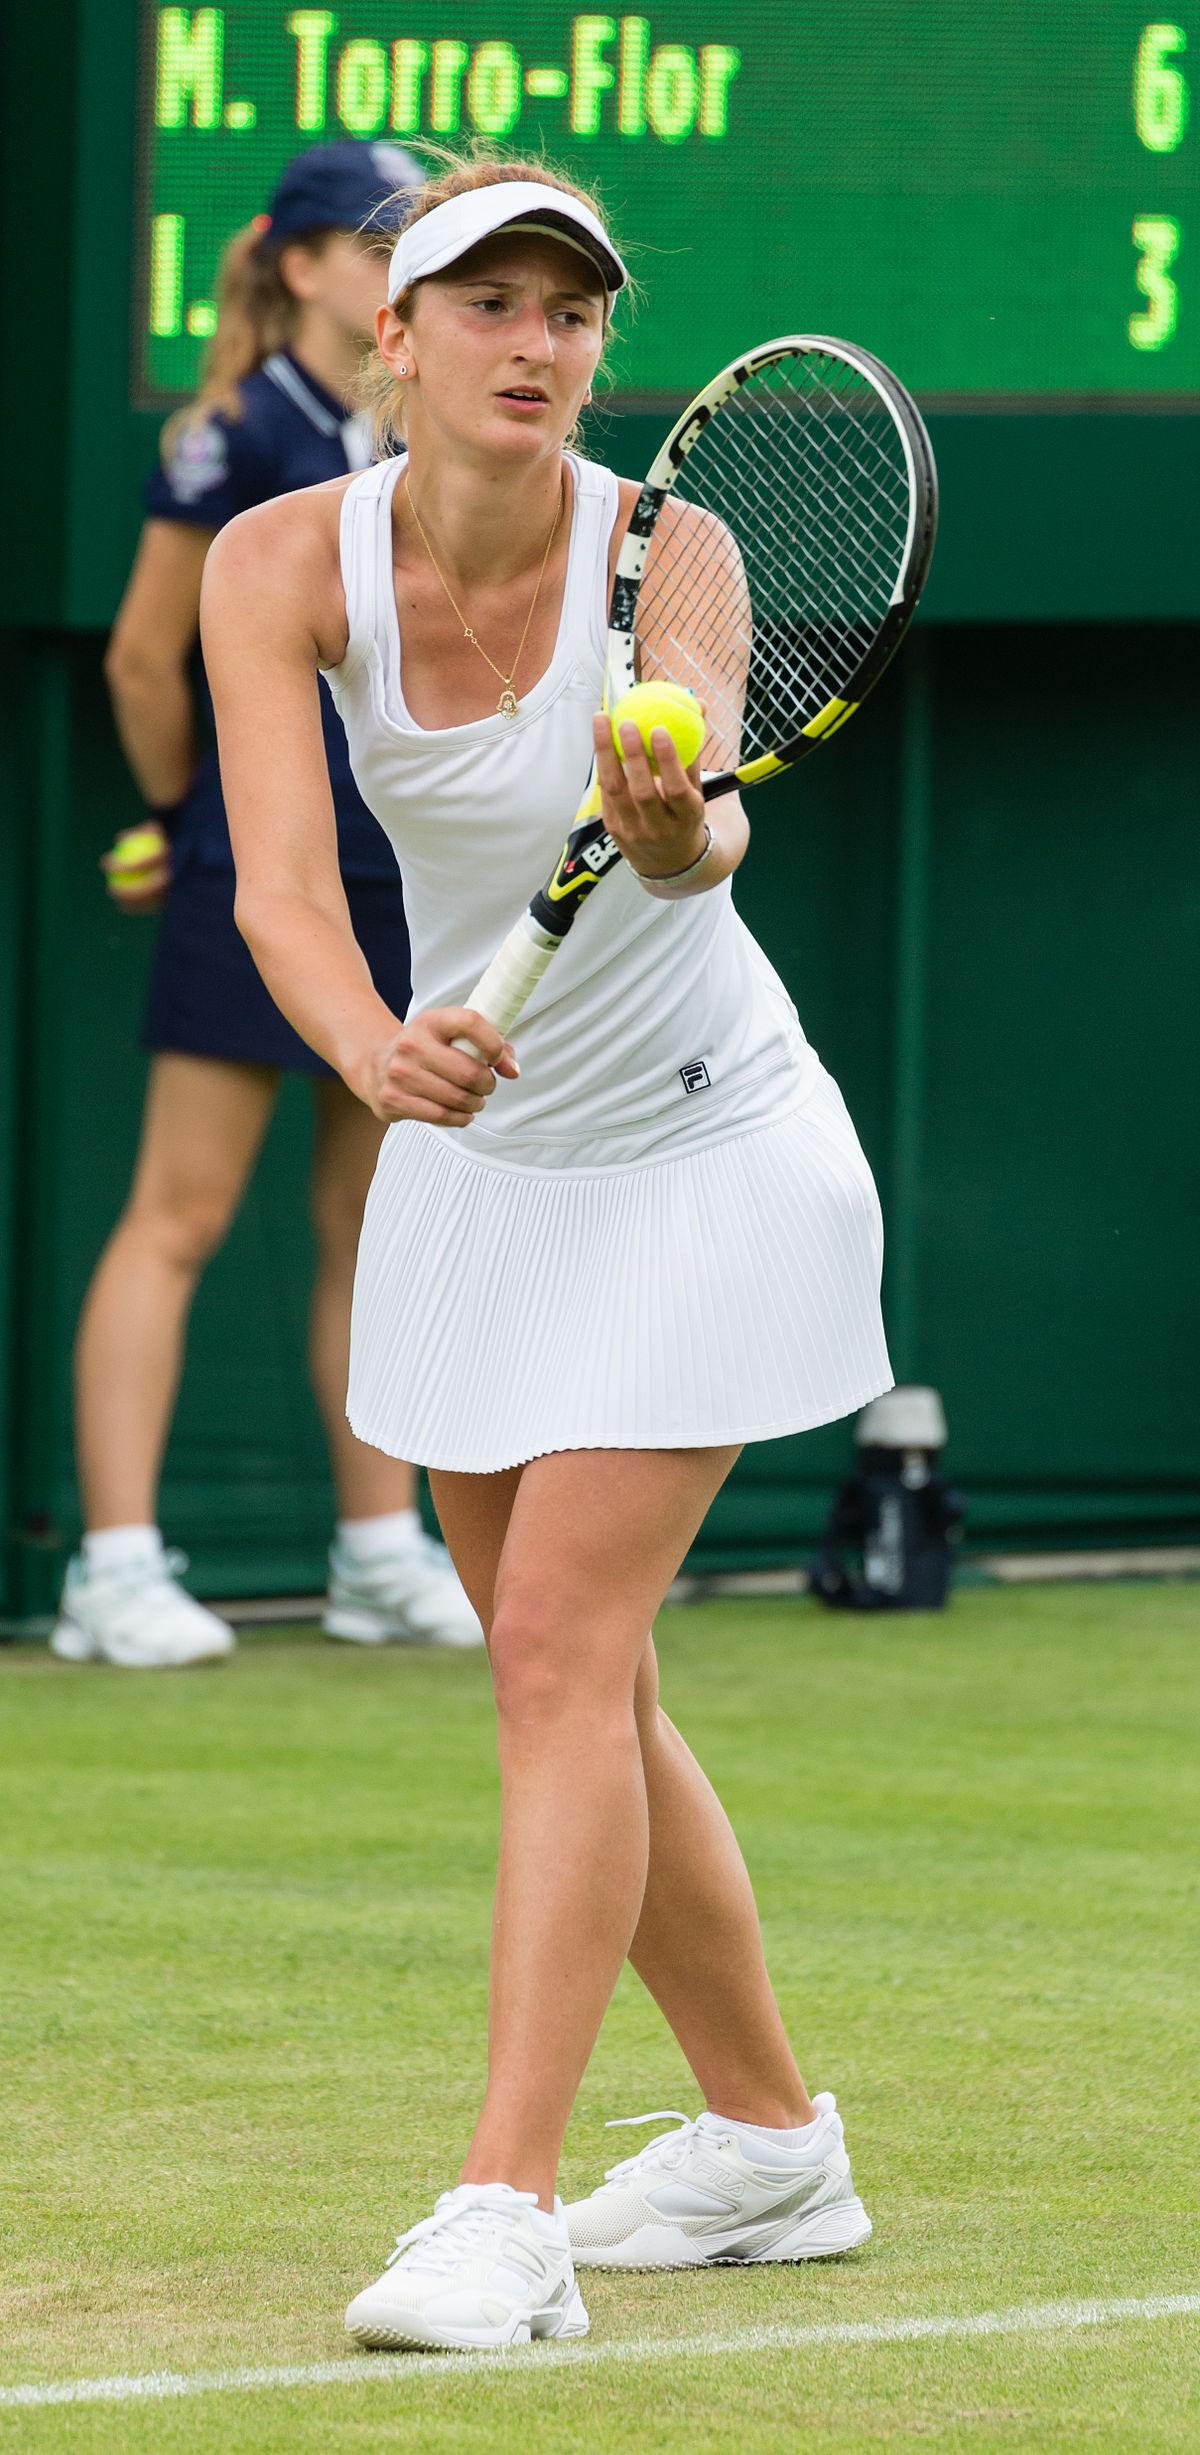 Irina Begu makes it to the third round at Roland Garros  |Irina Begu